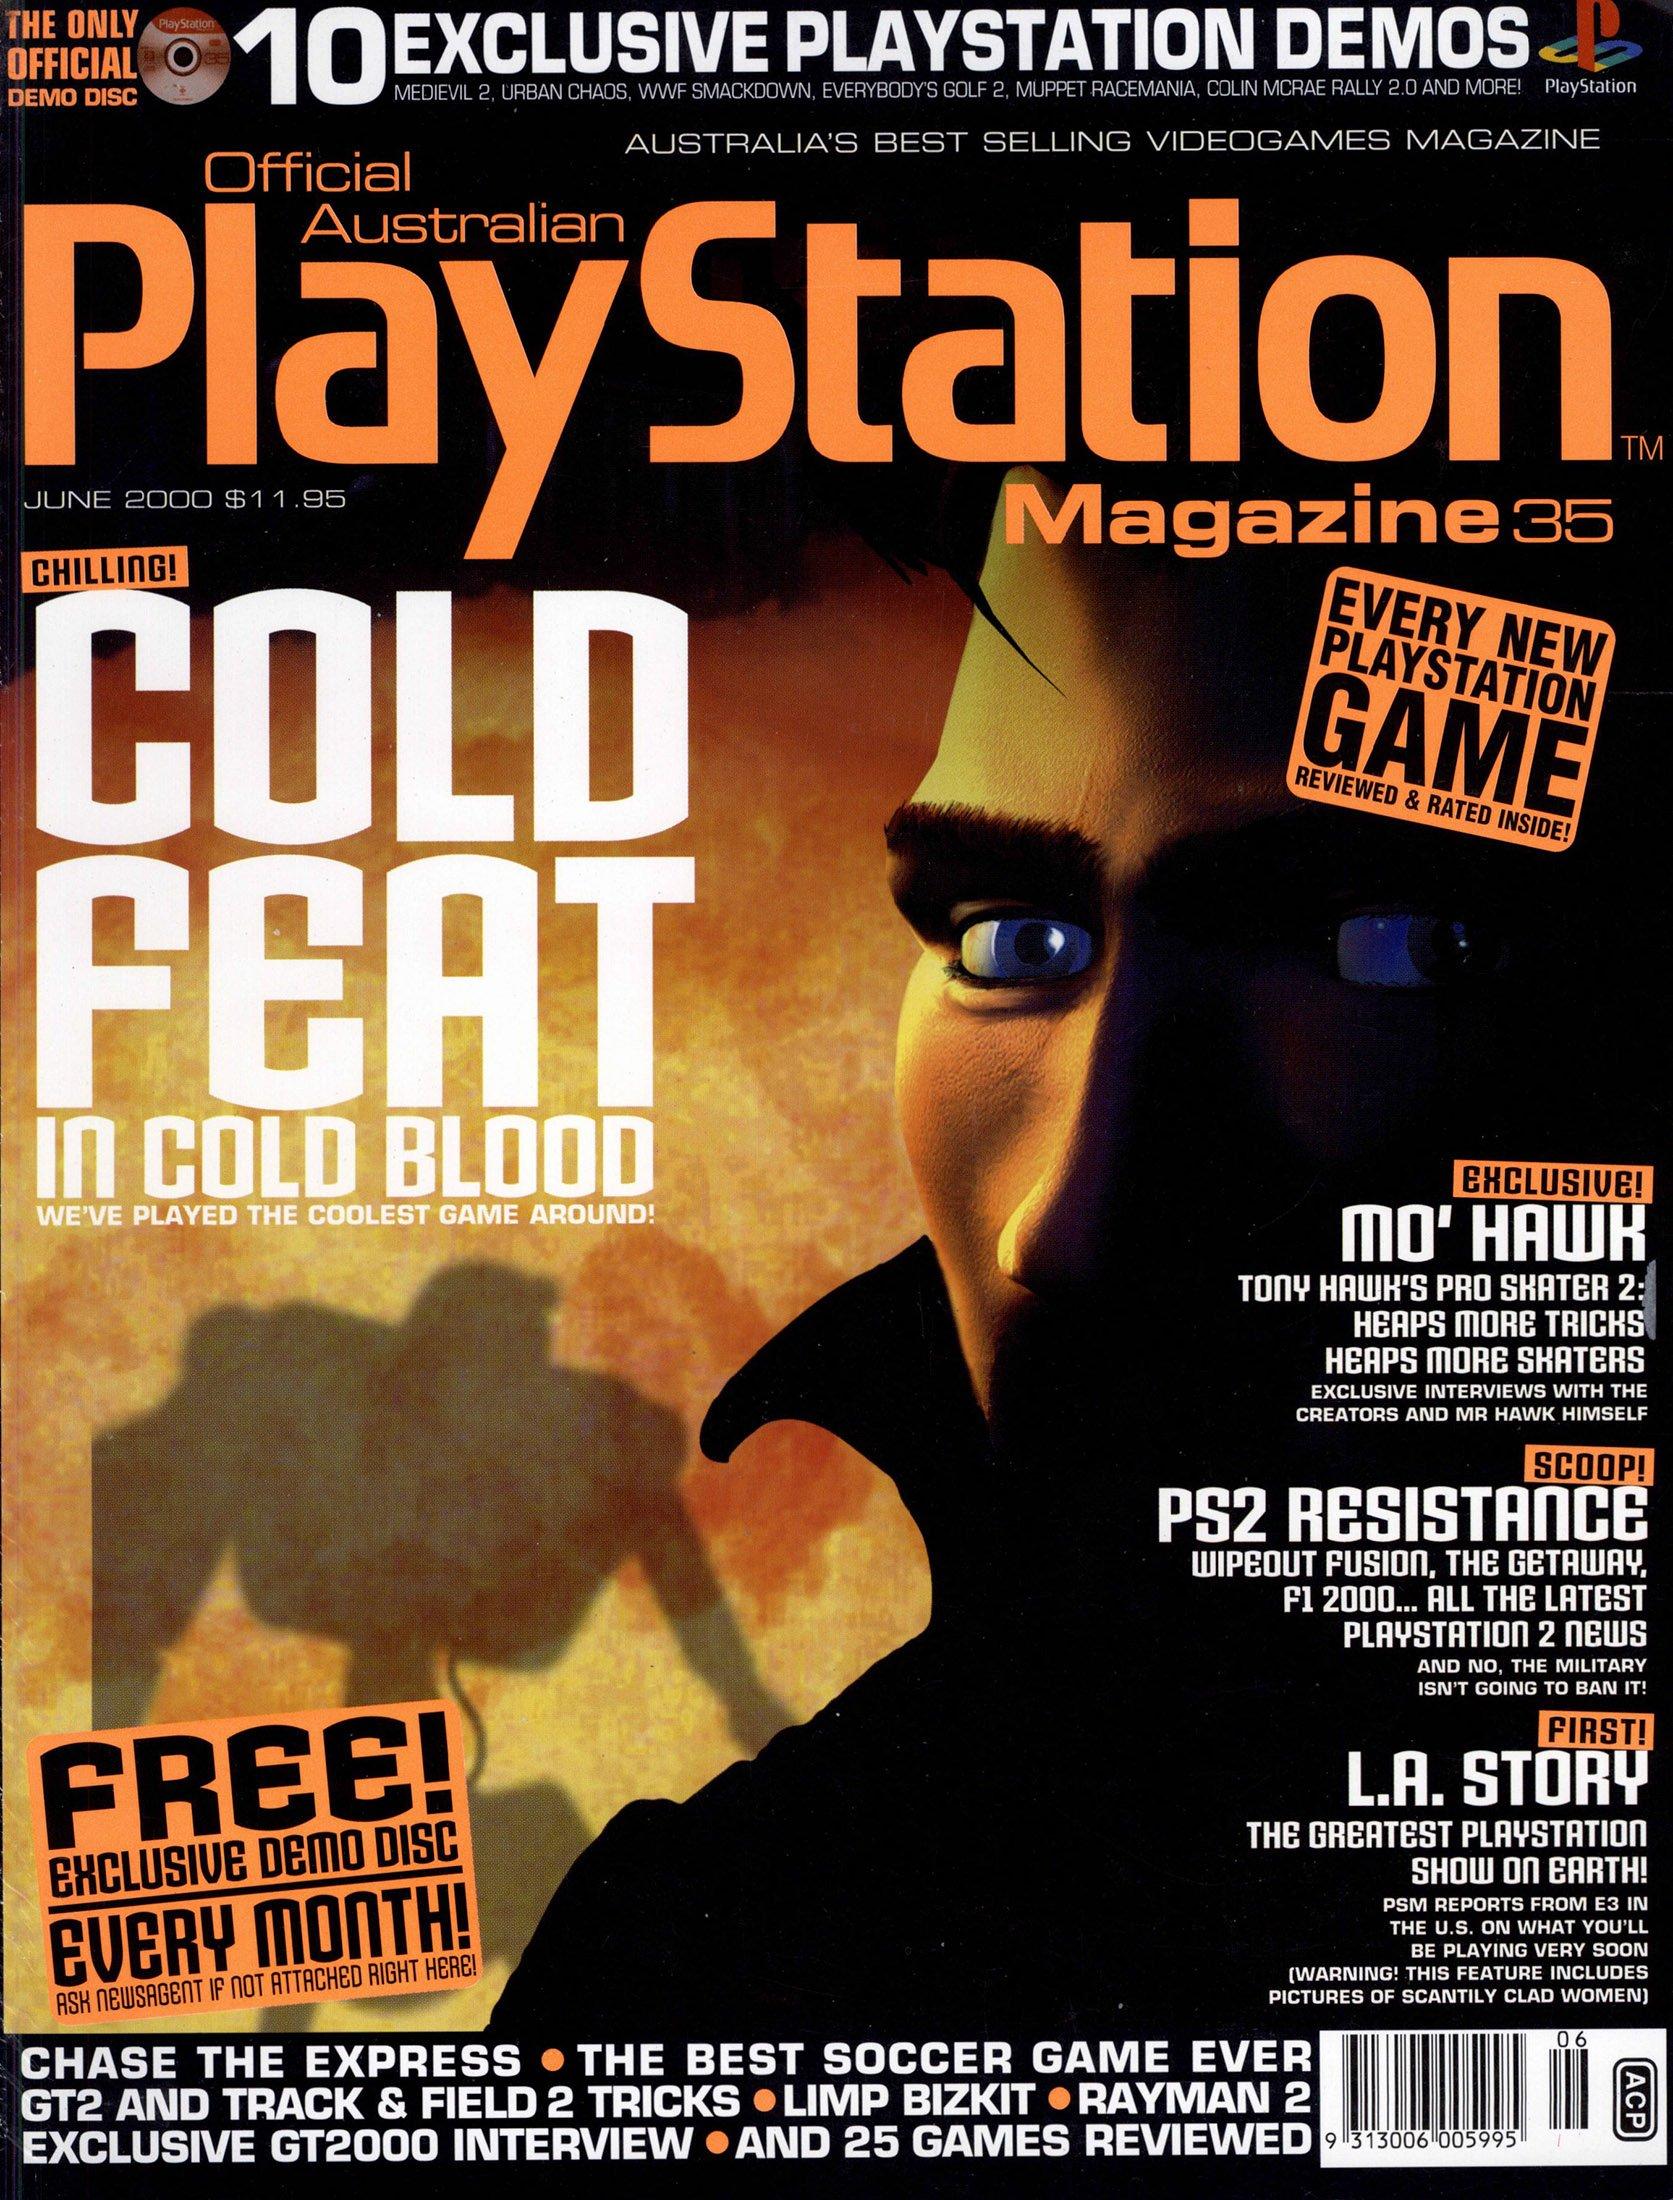 Official Australian PlayStation Magazine 035 (June 2000)